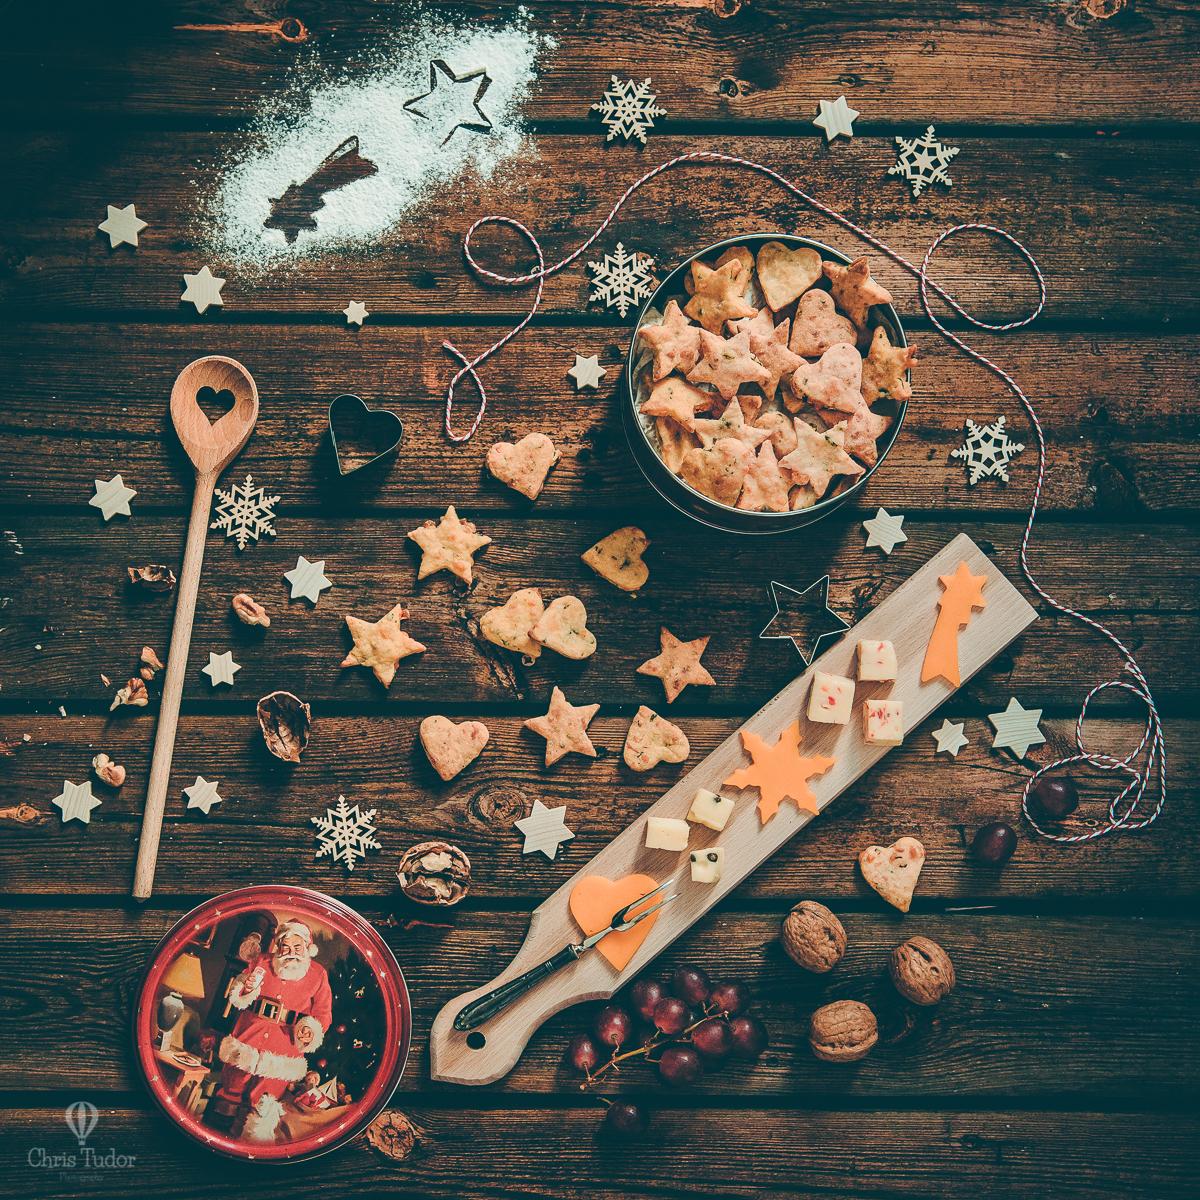 cristina-tudor-food-photography (12).jpg